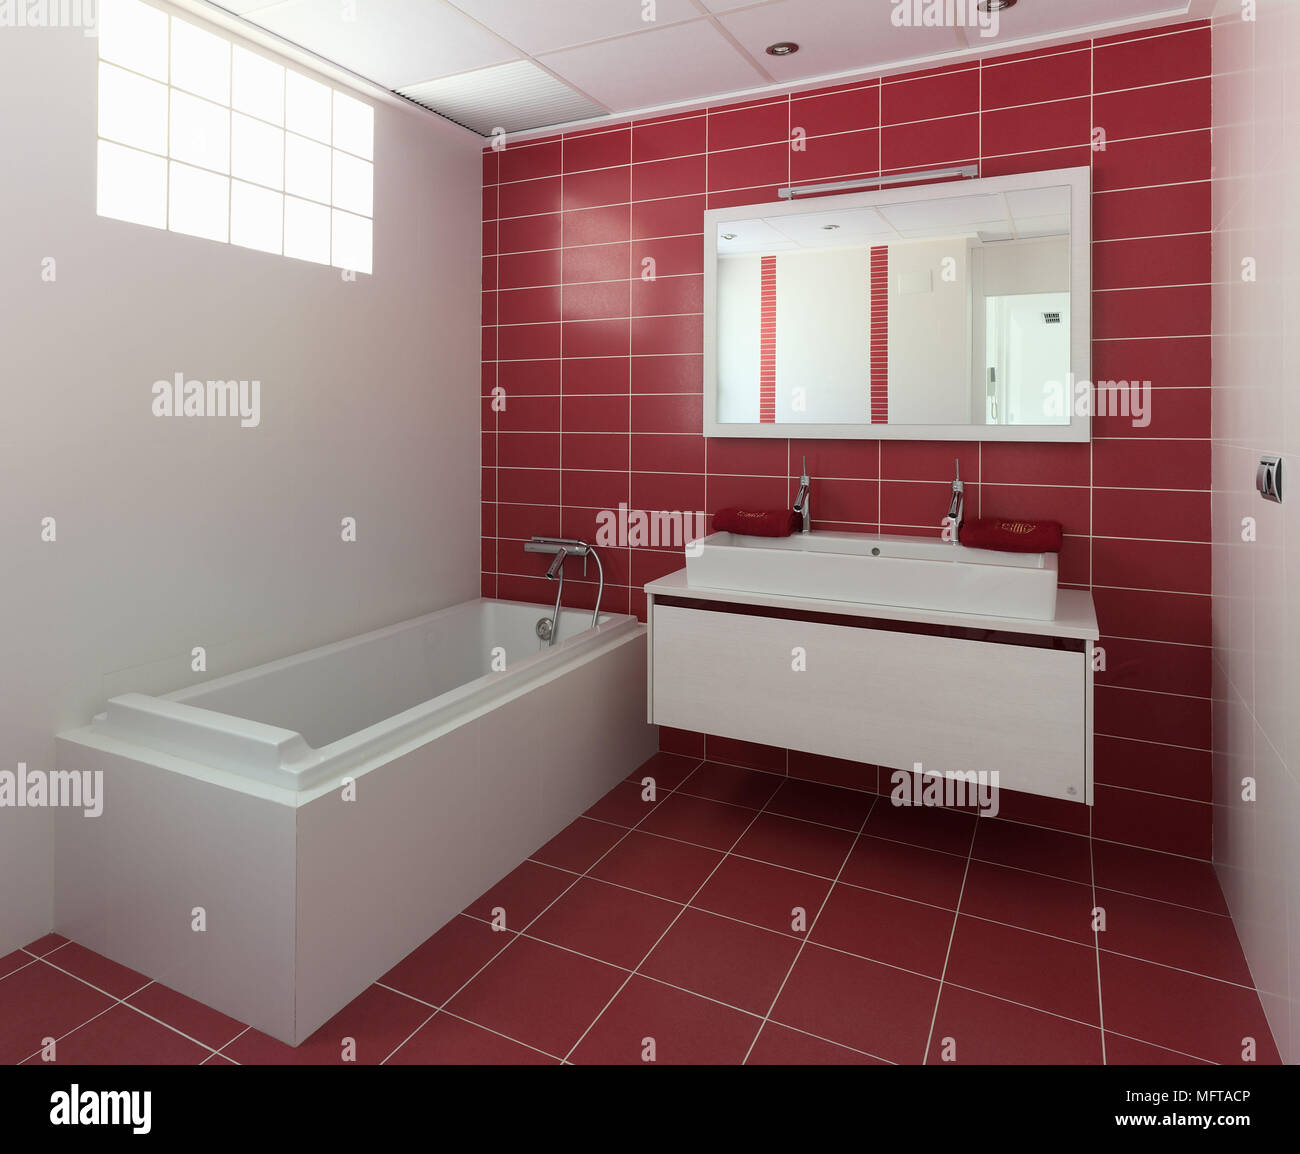 Washbasin on wall mounted unit next to bathtub in modern red bathroom Stock Photo